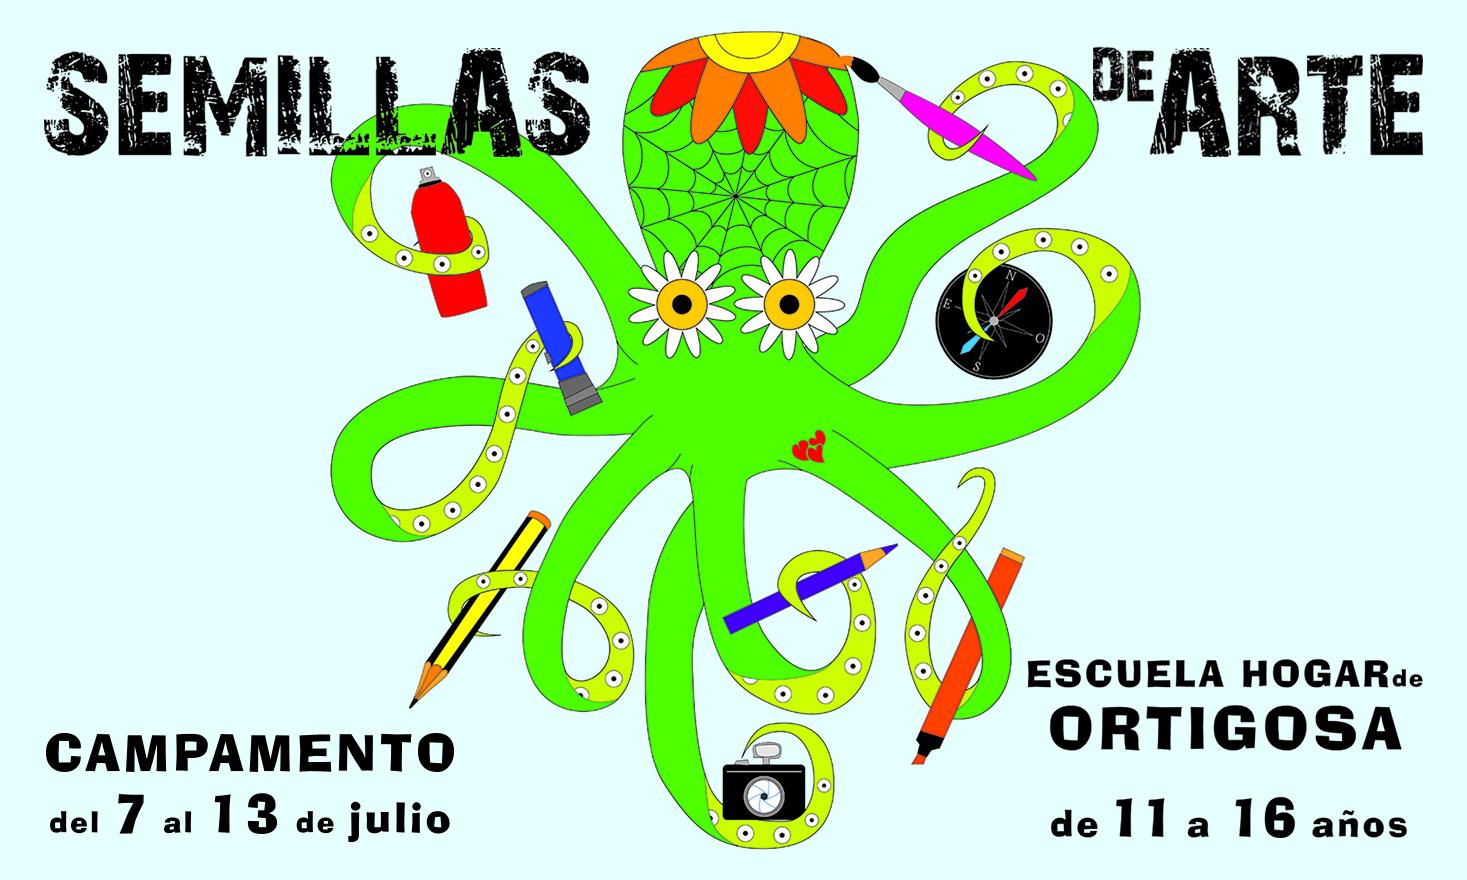 Semillas de Arte - Campamento en Ortigosa de Cameros - Pigmento Espacio Creativo